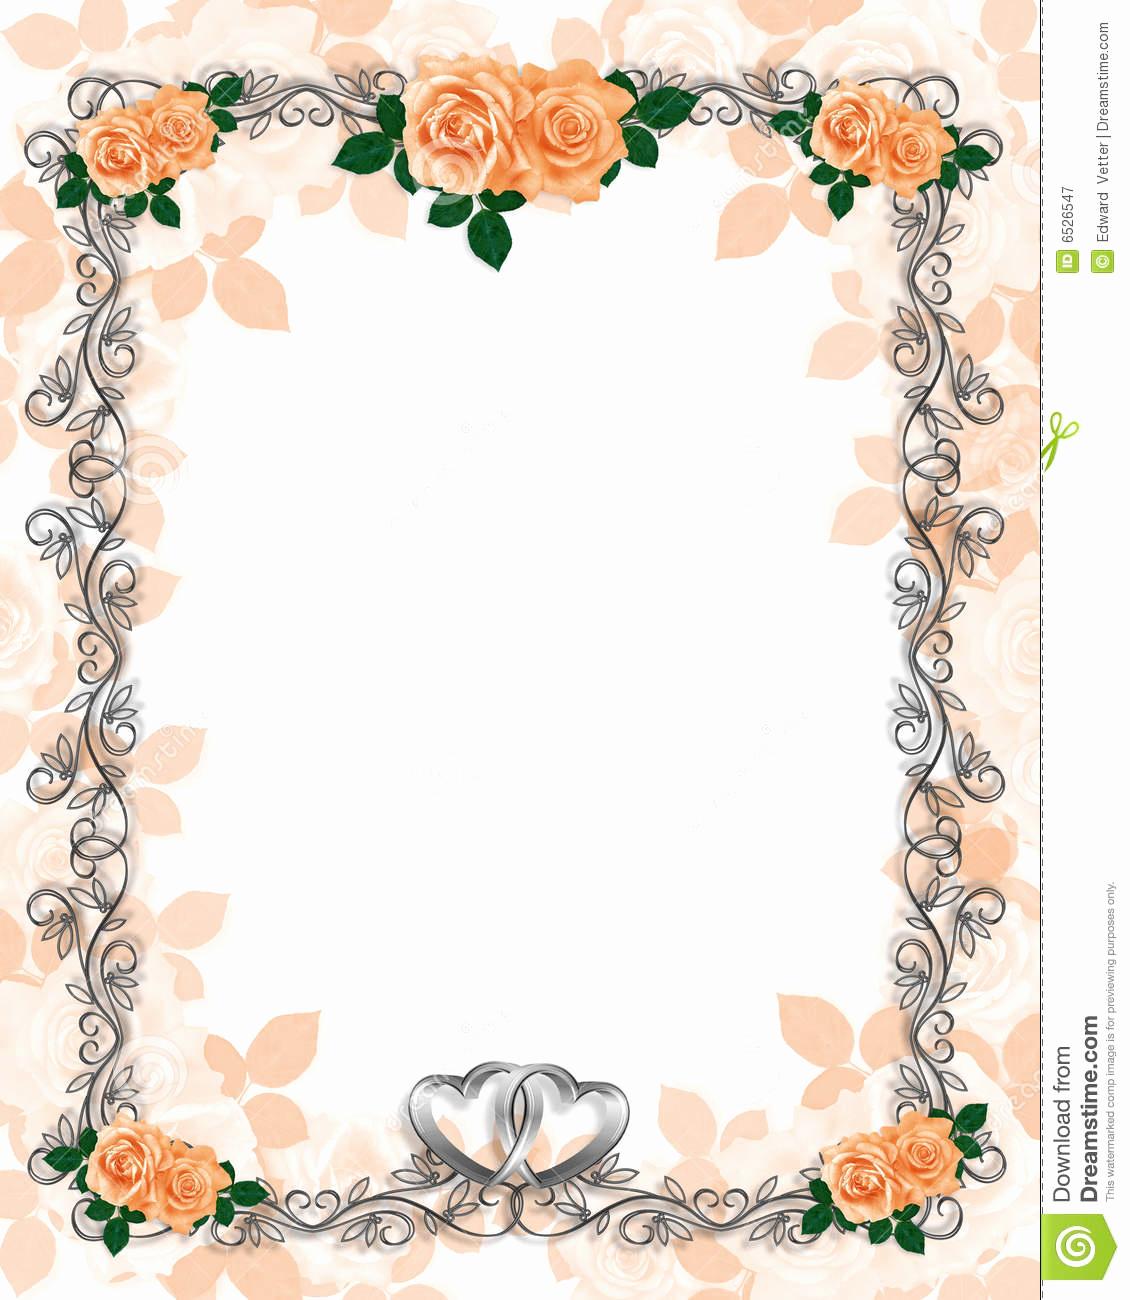 Wedding Invitation Borders Design Inspirational Free Printable Borders for Wedding Invitations